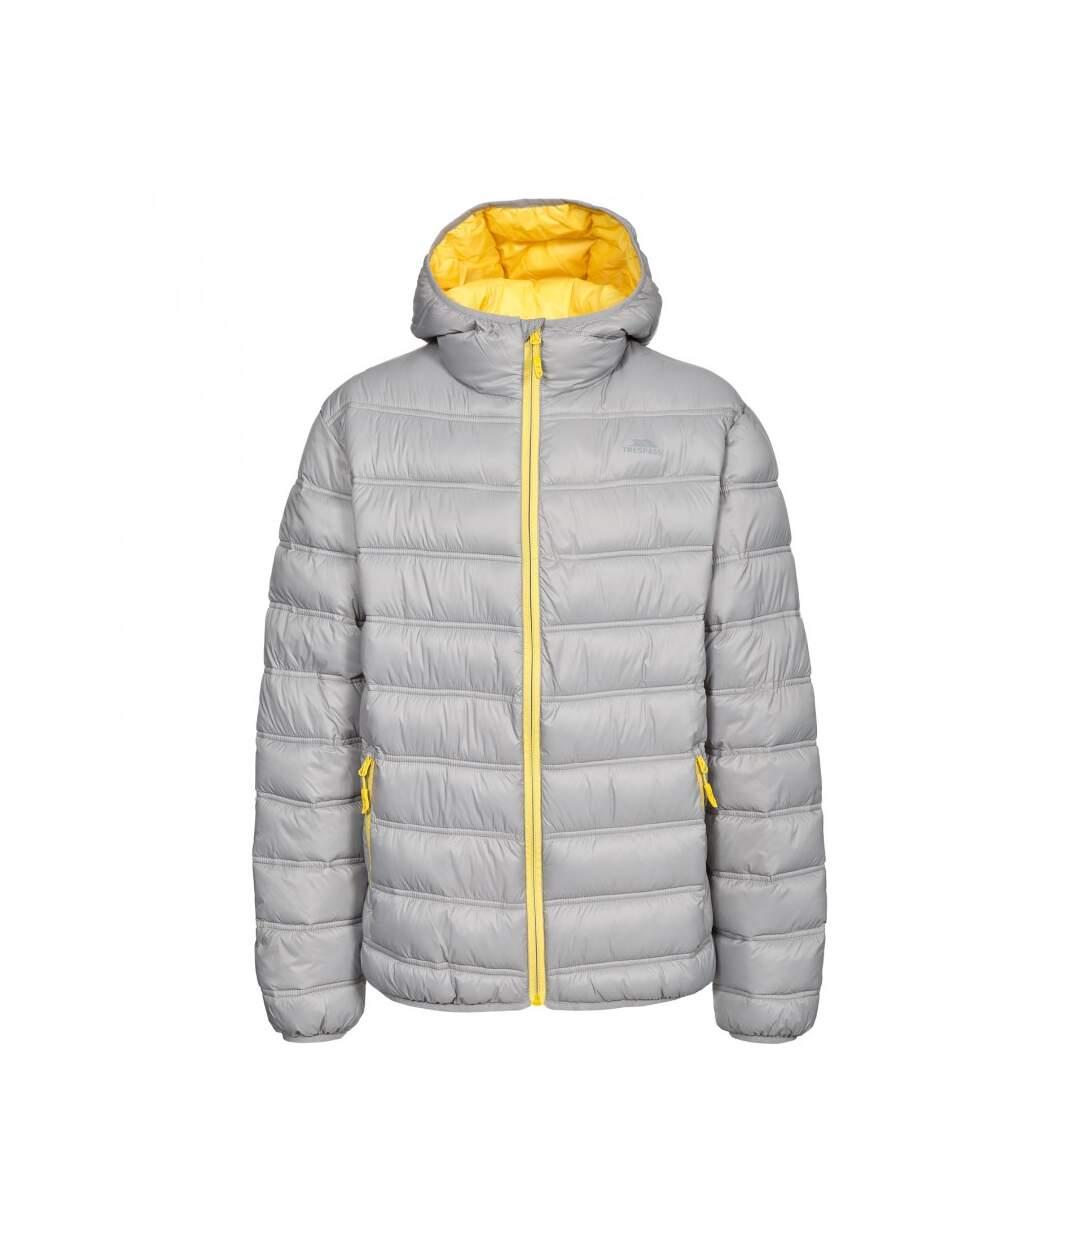 Trespass Mens Irrate Padded Jacket (Cool Grey) - UTTP1142